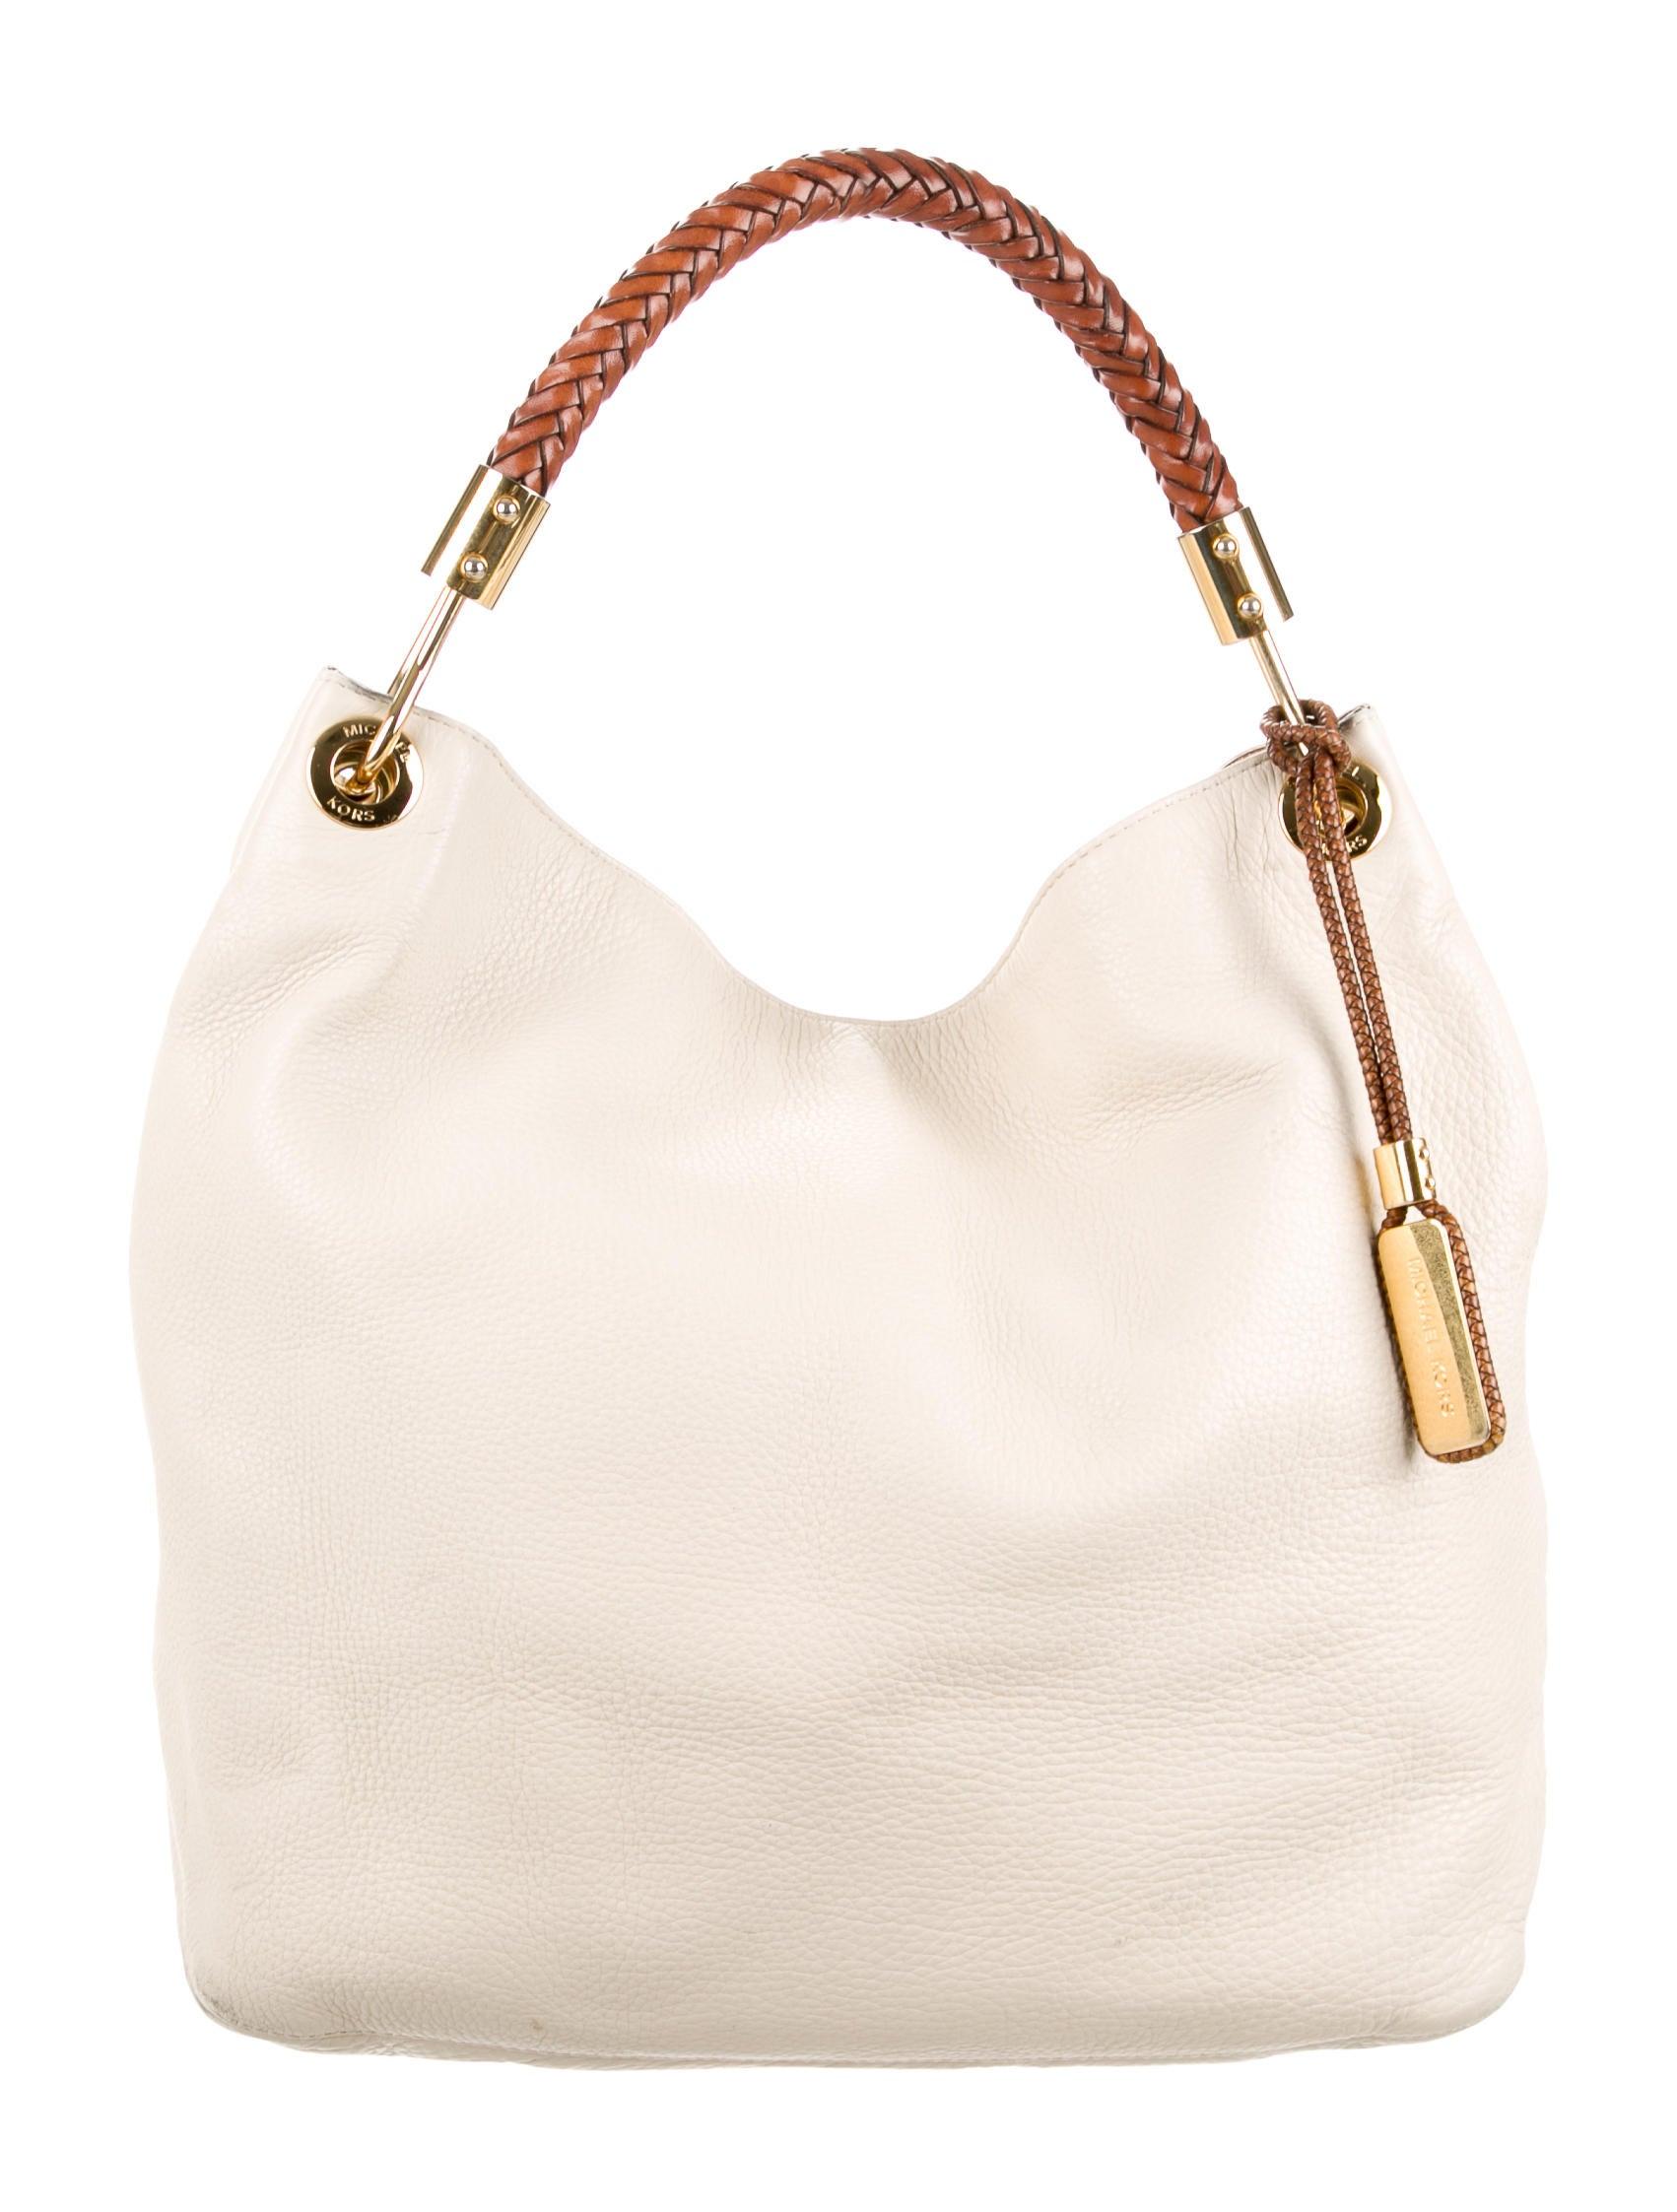 479f59aacda3 Michael Kors Skorpios Hobo Bag - Handbags - MIC50881 | The RealReal